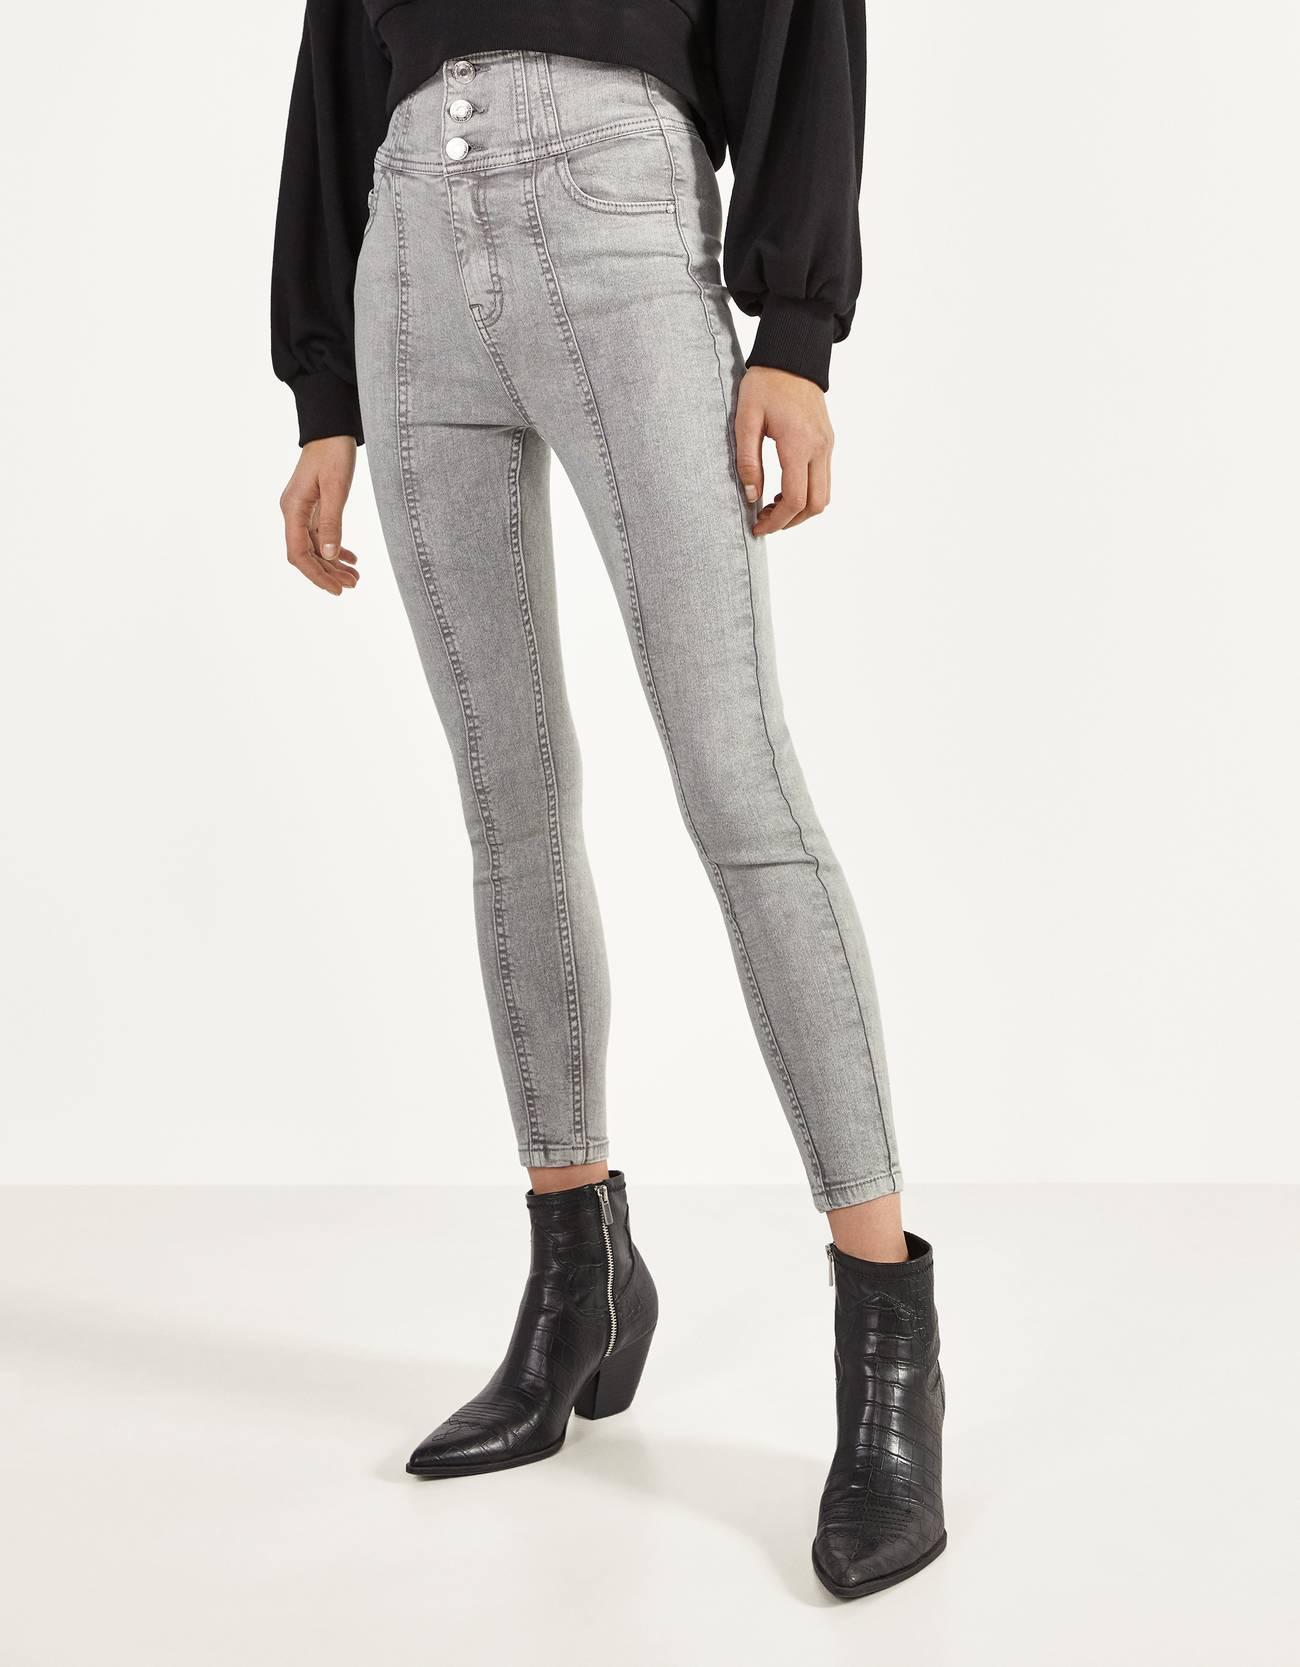 Skinny trousers with a cummerbund waist.